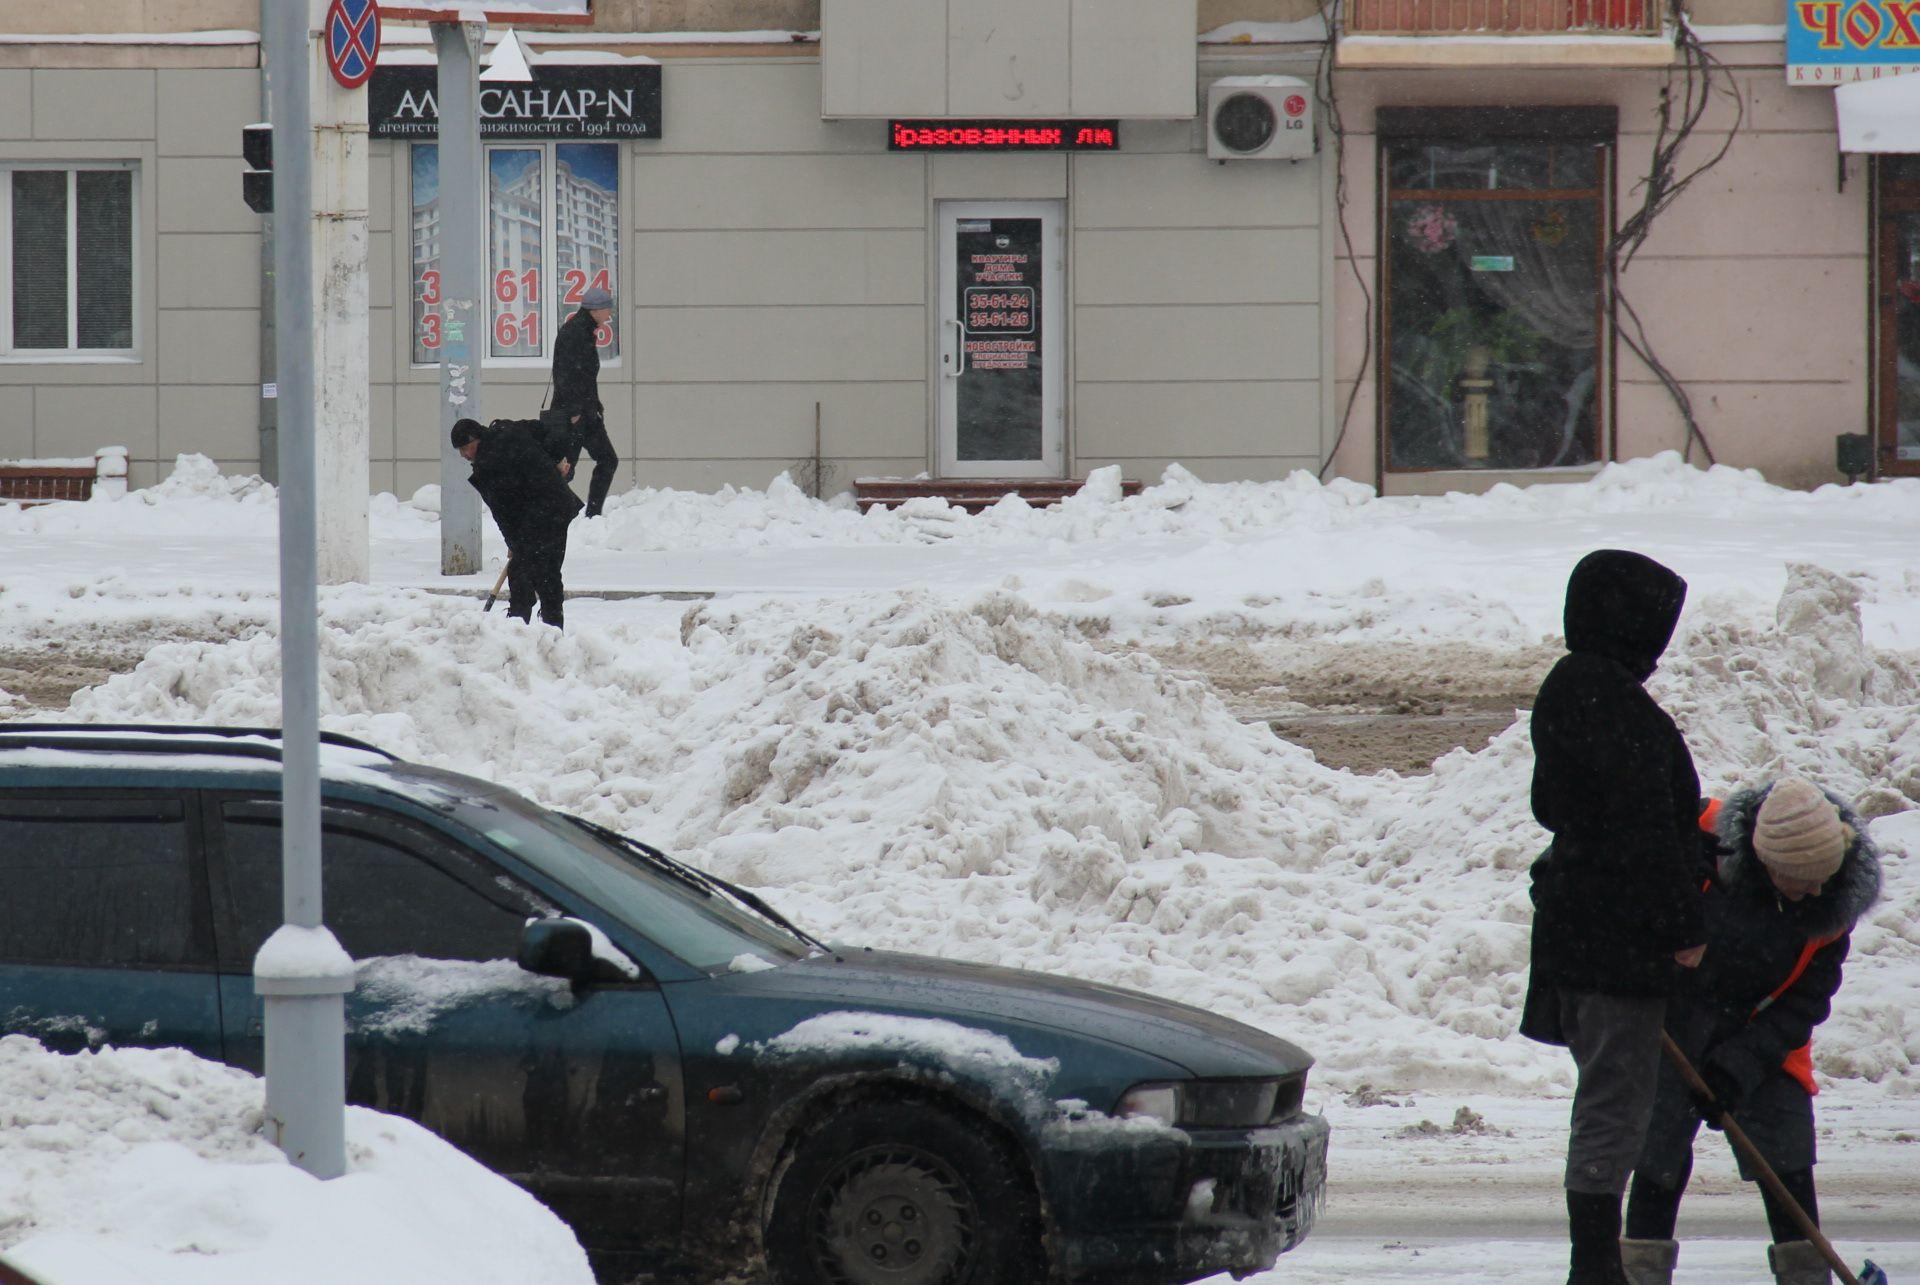 Коляда-Plays 2018 в Екатеринбурге: программа, даты, место, цены